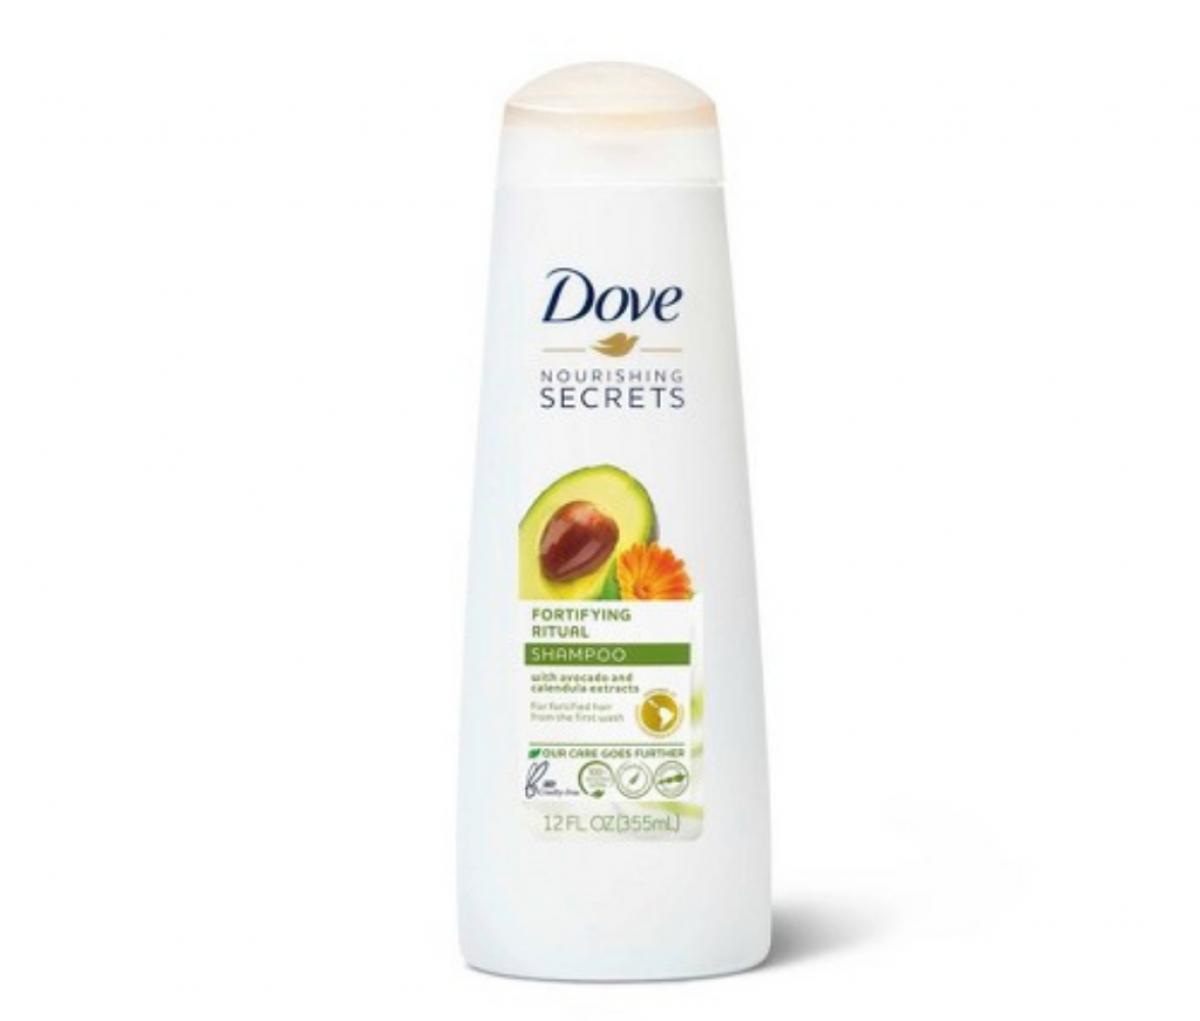 Dove 12oz Fortify Ritual Shampoo